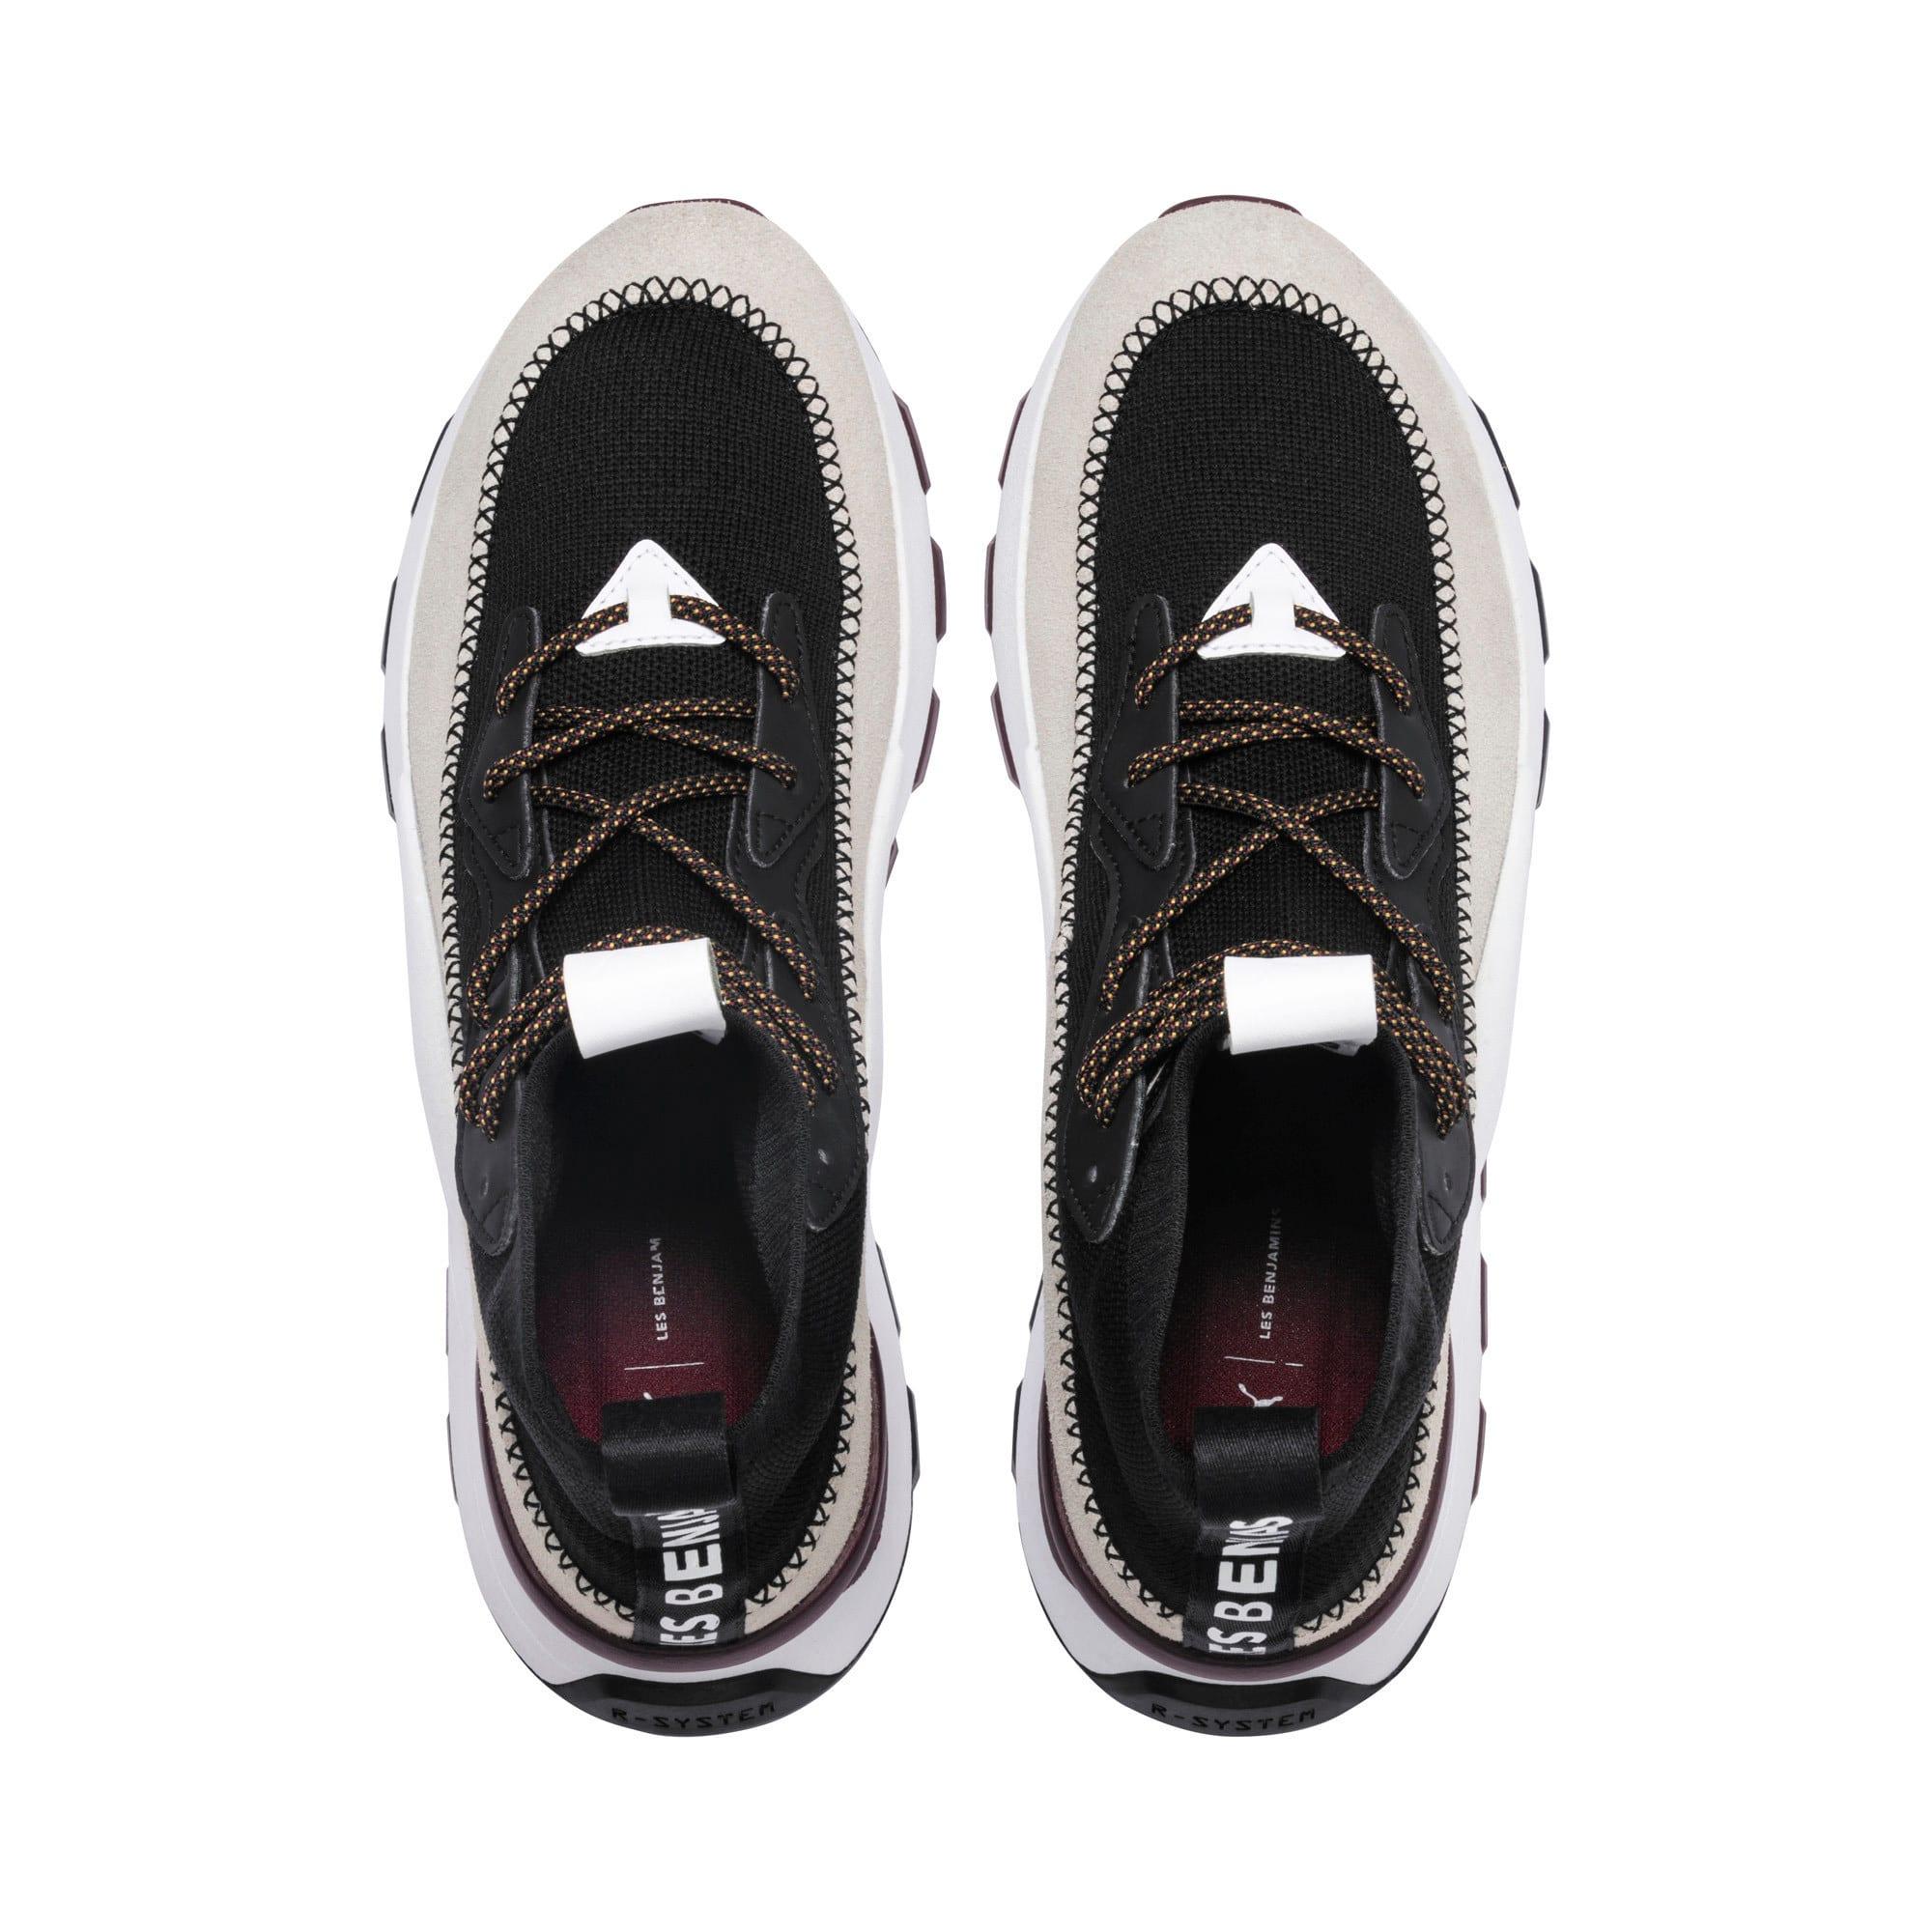 Thumbnail 8 of RS-0 LES BENJAMINS Sneakers, Puma White-Puma Black, medium